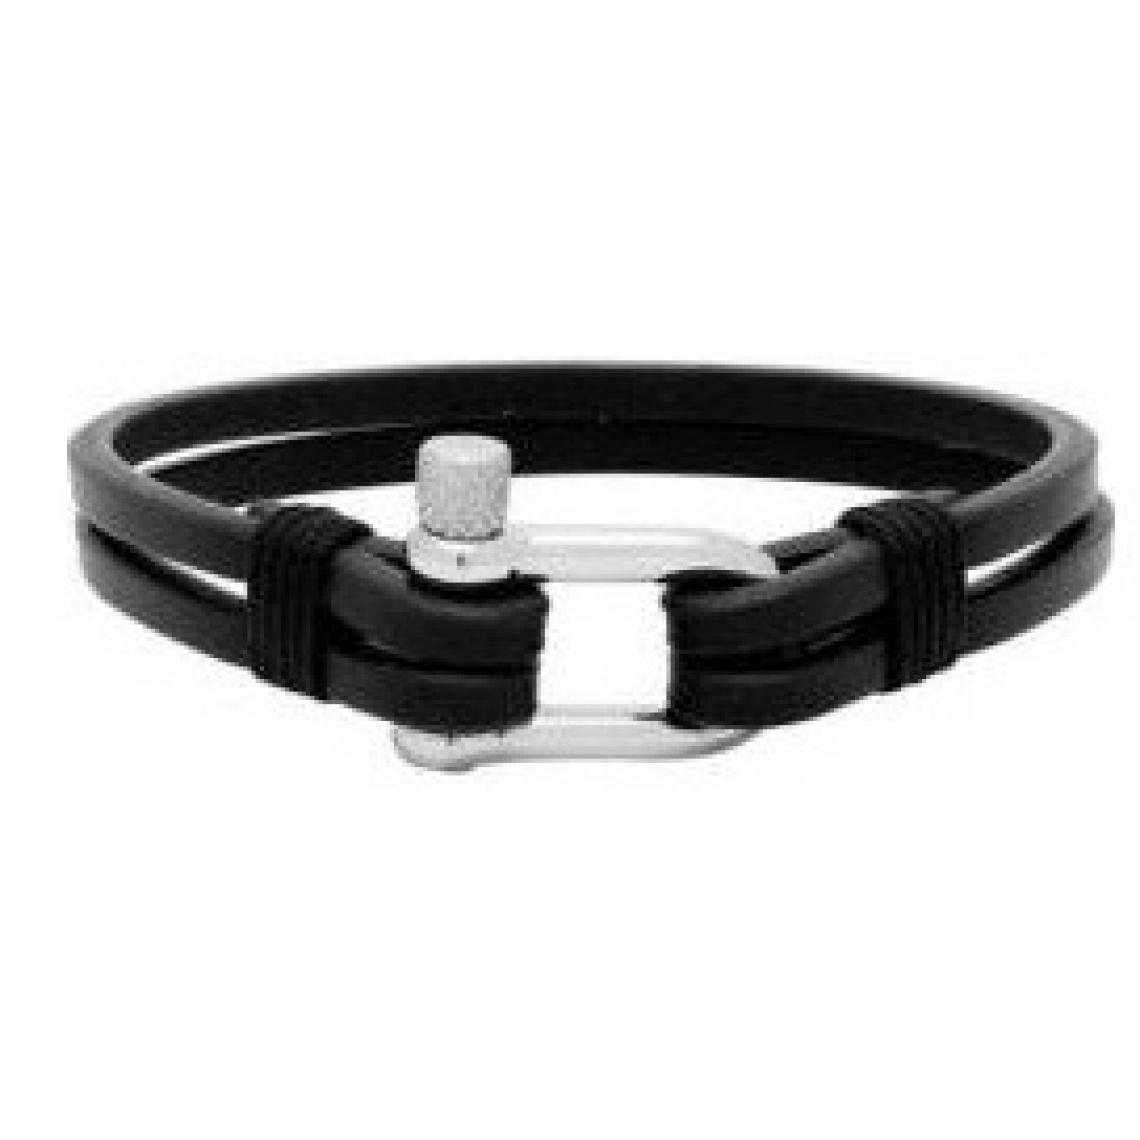 B35016001m Noir Cuir Winch Rochet Bracelet Acier srdtQCh